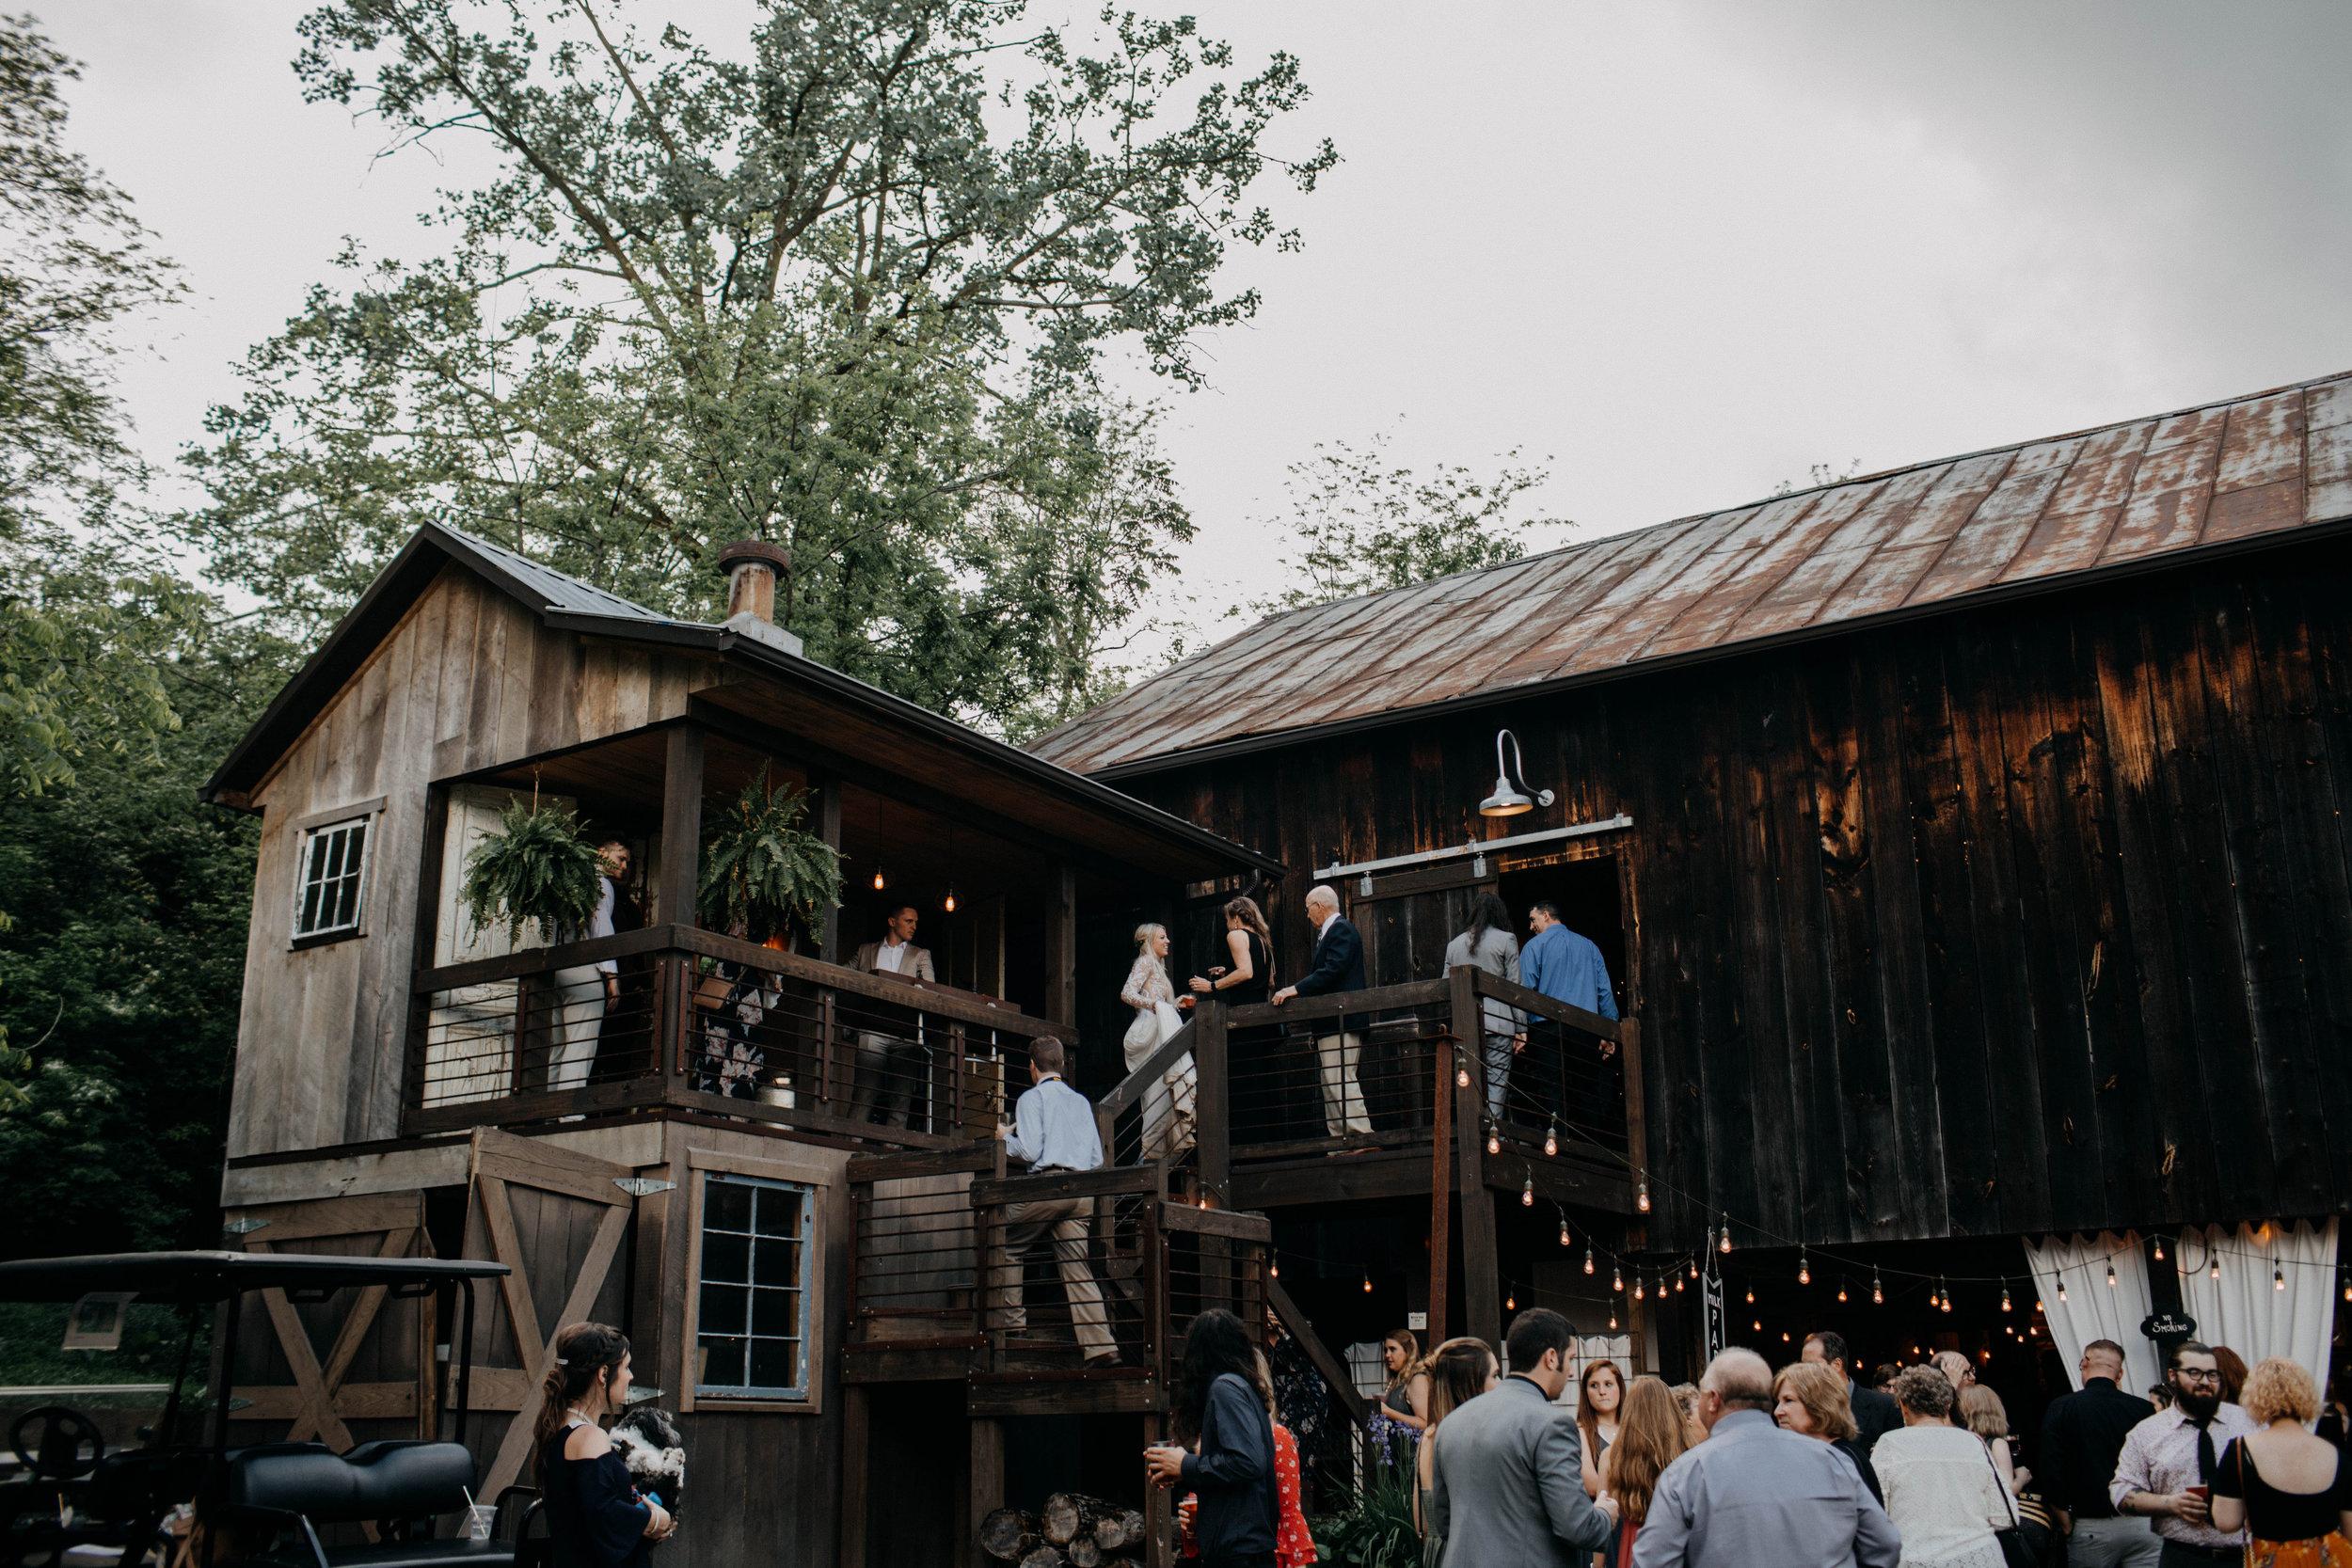 Columbus ohio wedding photographer canyon run ranch wedding grace e jones photography wedding photographer266.jpg